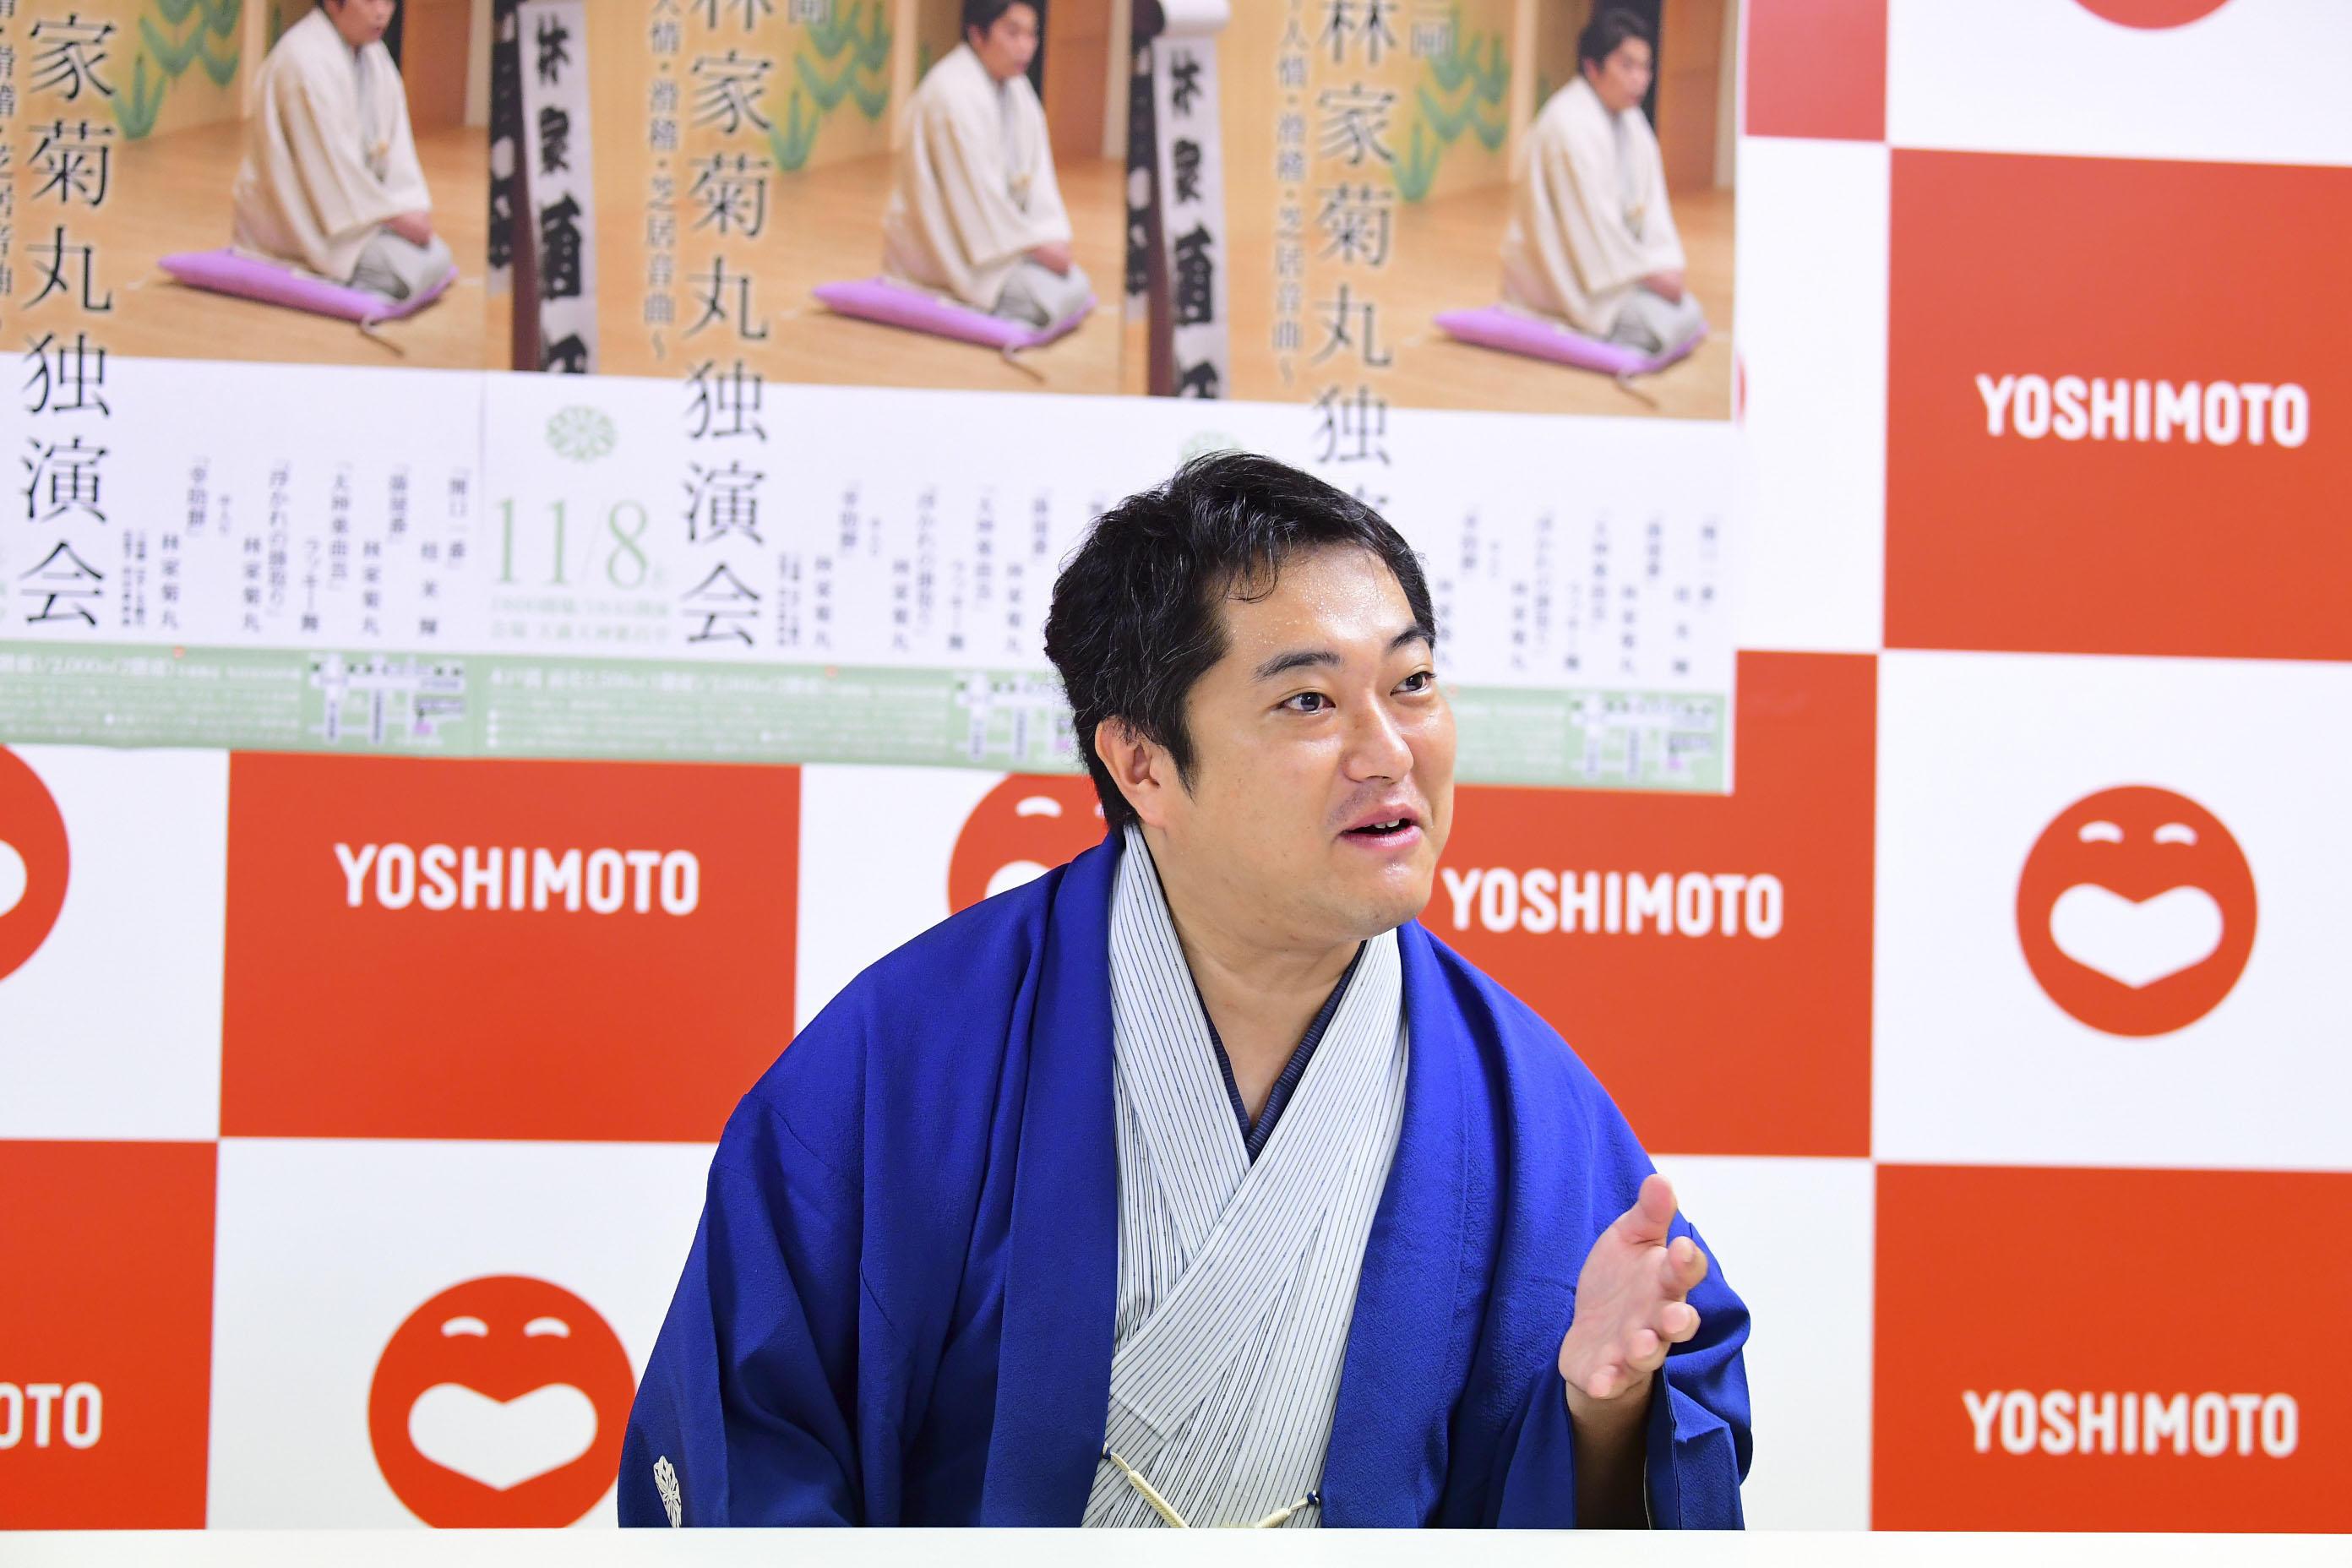 http://news.yoshimoto.co.jp/20171003083741-eef5295f173f6df6e5c2427cc44991bb4dc906e9.jpg